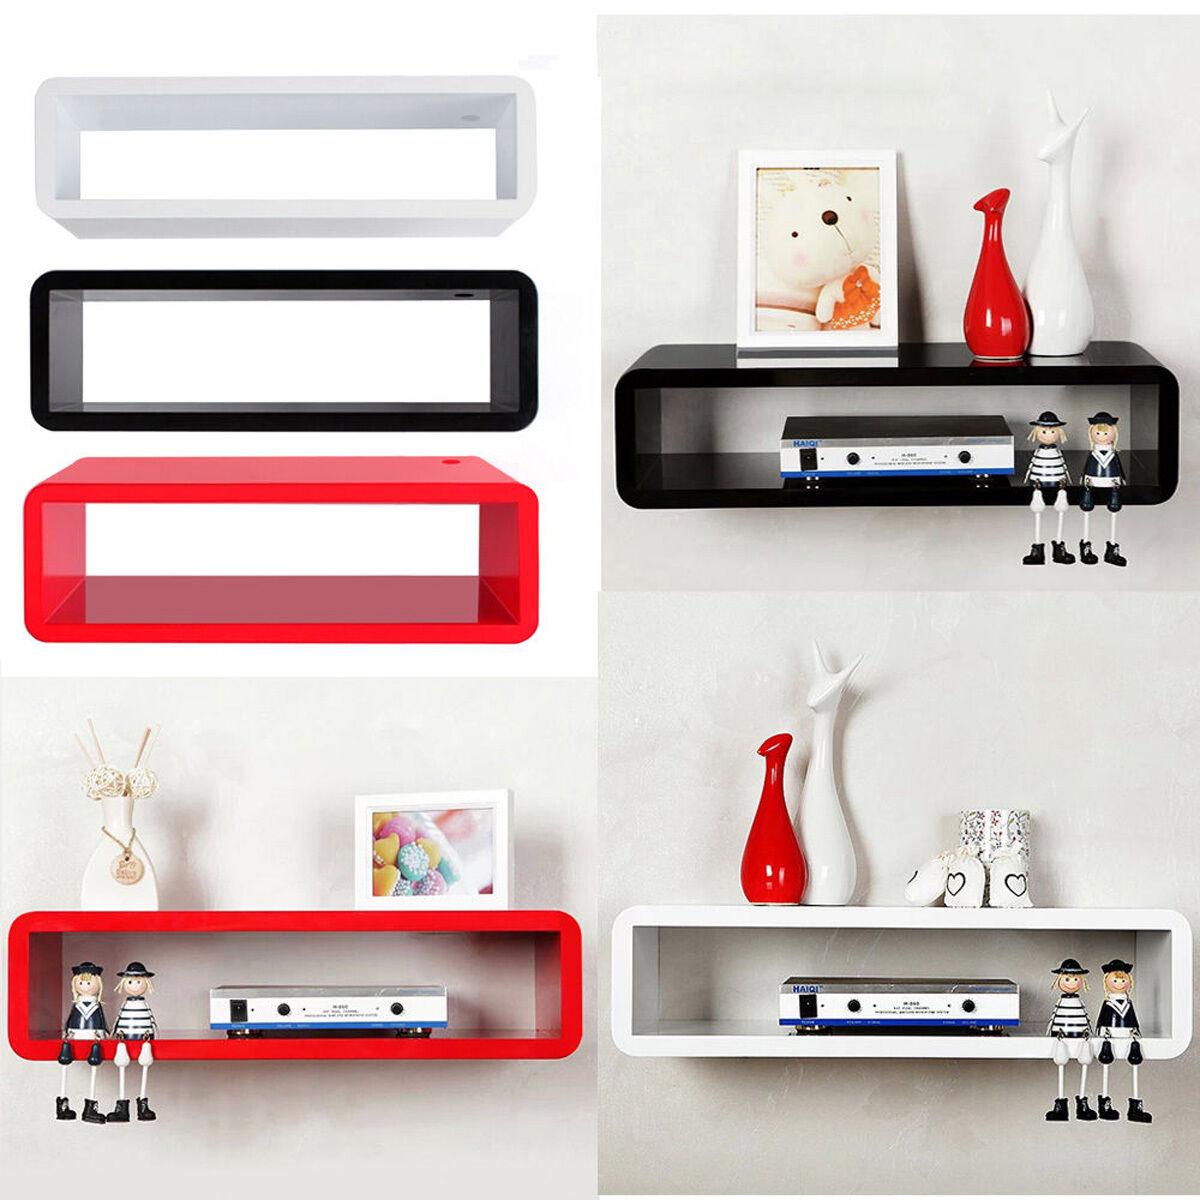 floating box shelves  ebay - xxcm floating wall mount shelf cube sky box dvd hifi unit shelfshelves